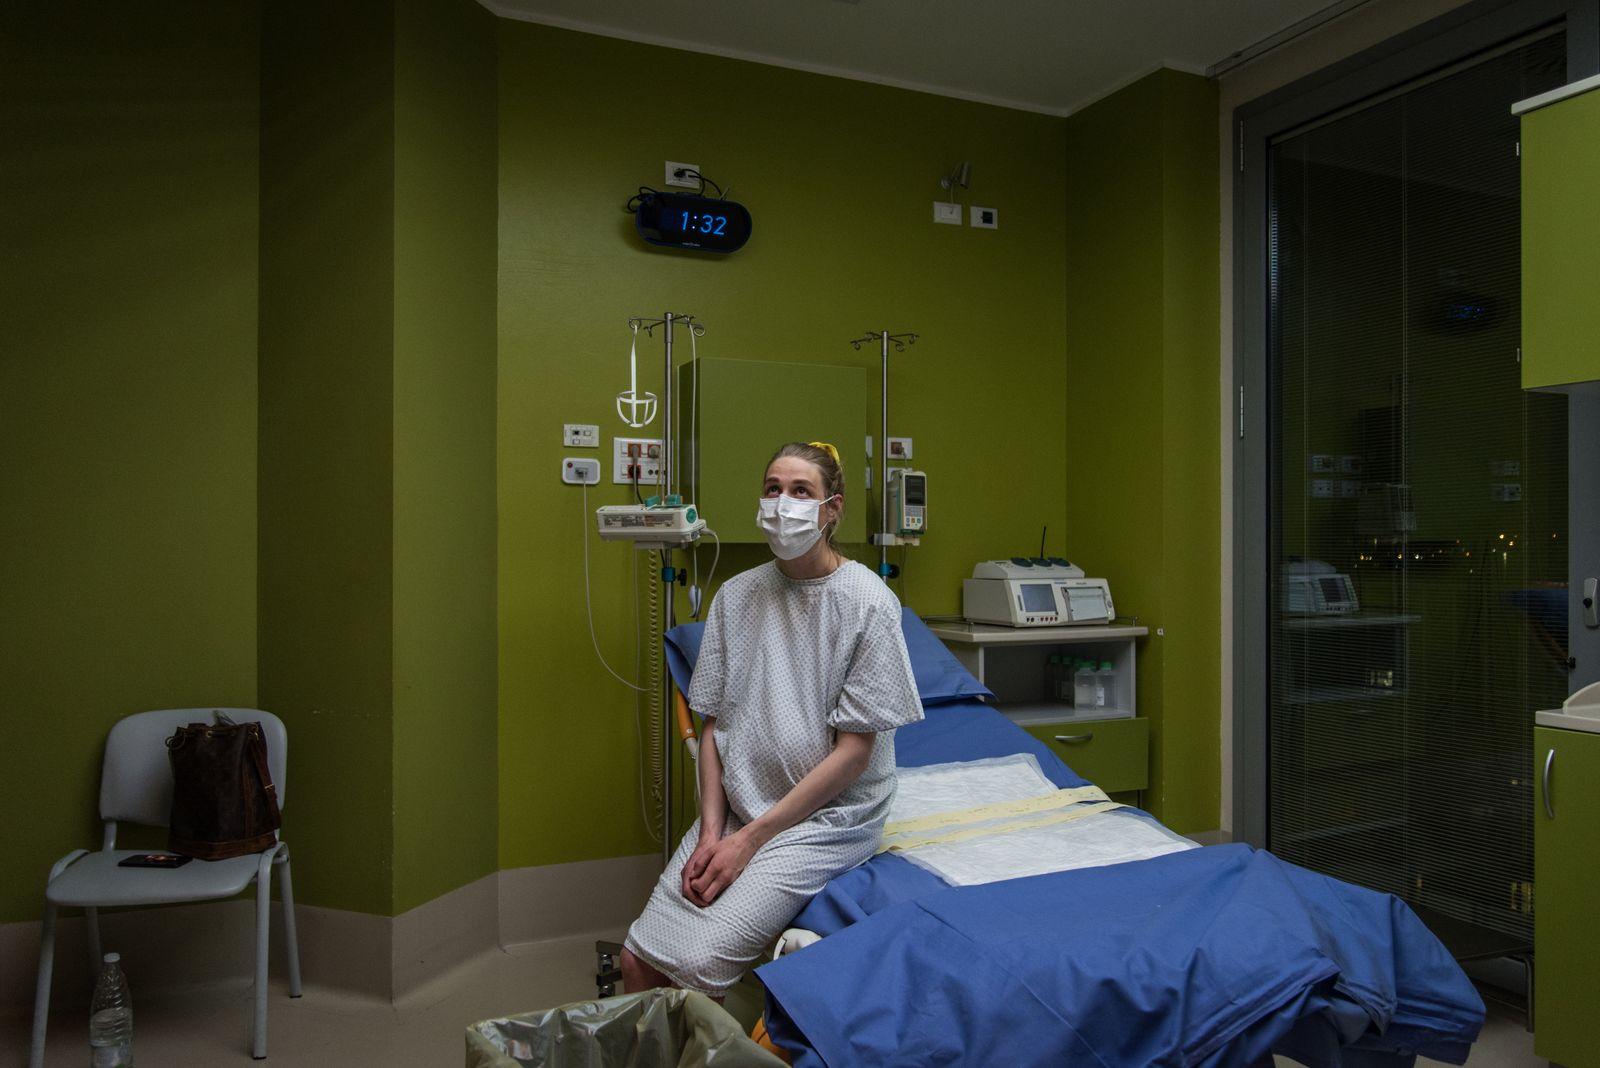 Italy, Milan - Childbirth in the time of coronavirus